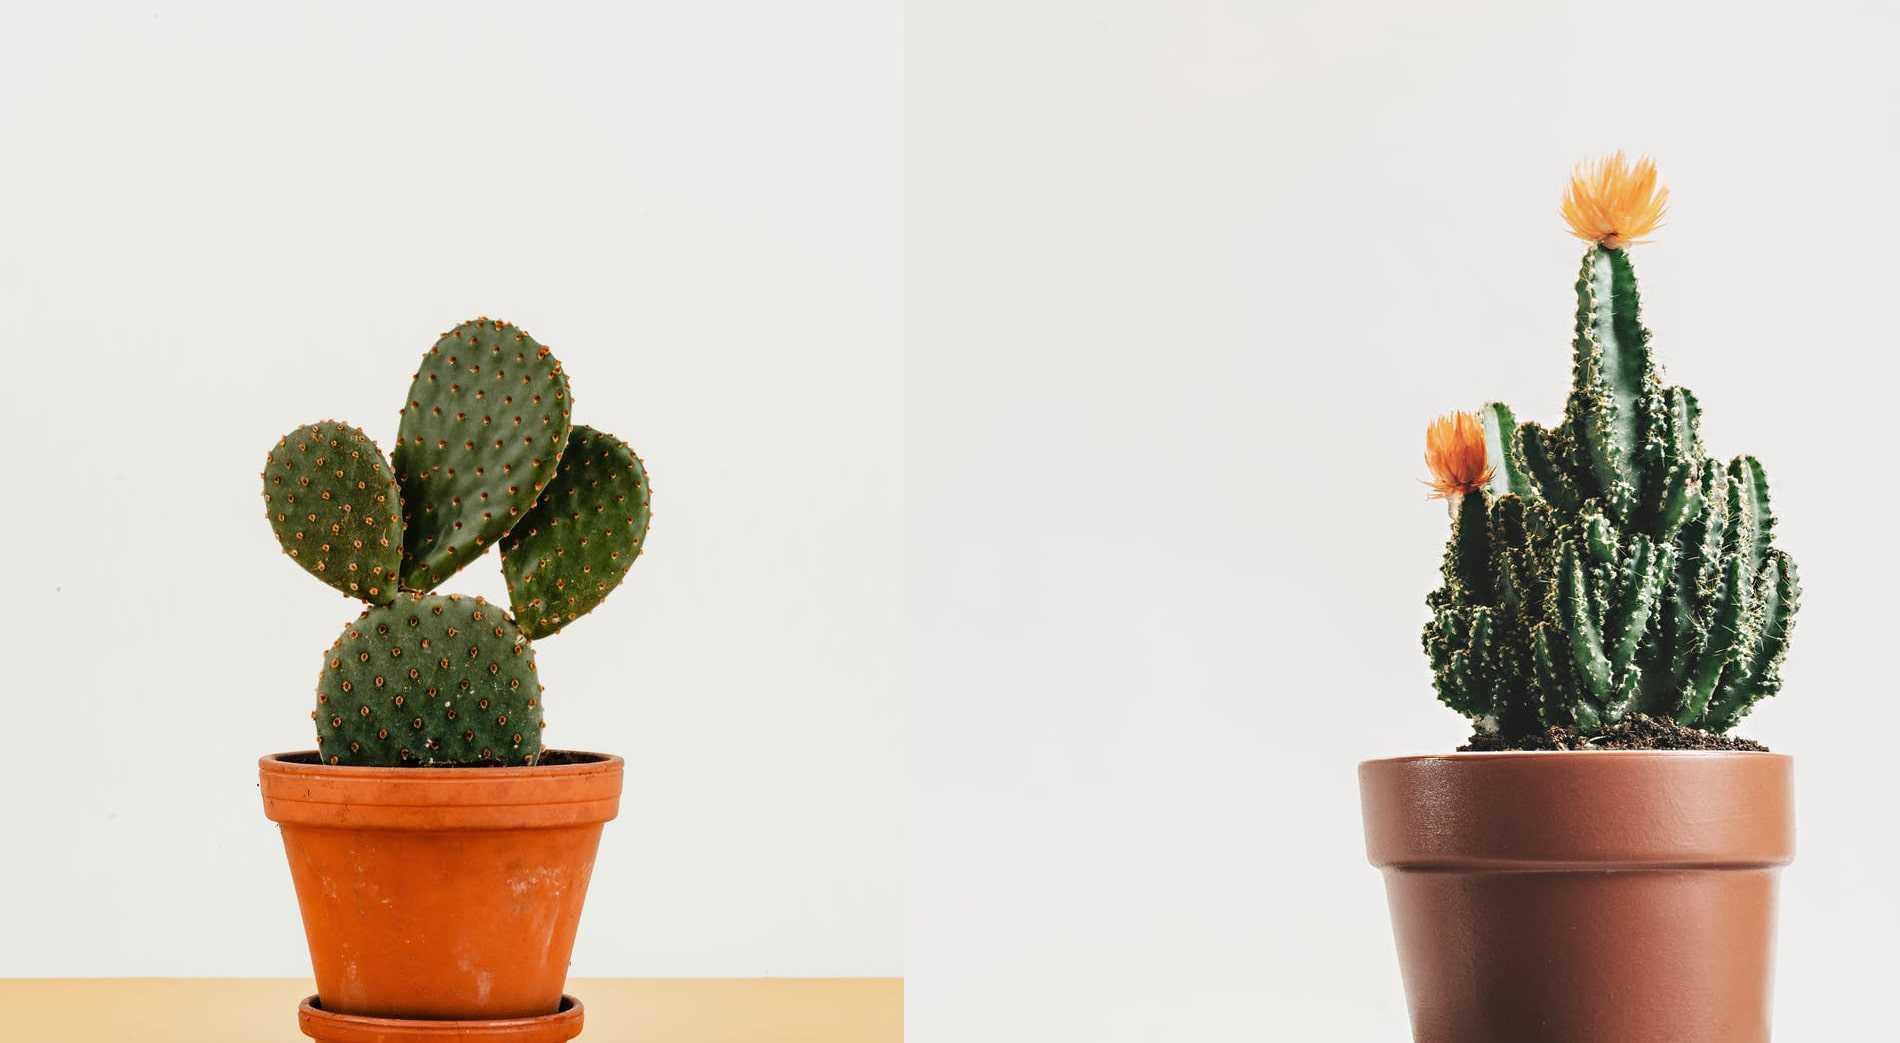 kaktus mini